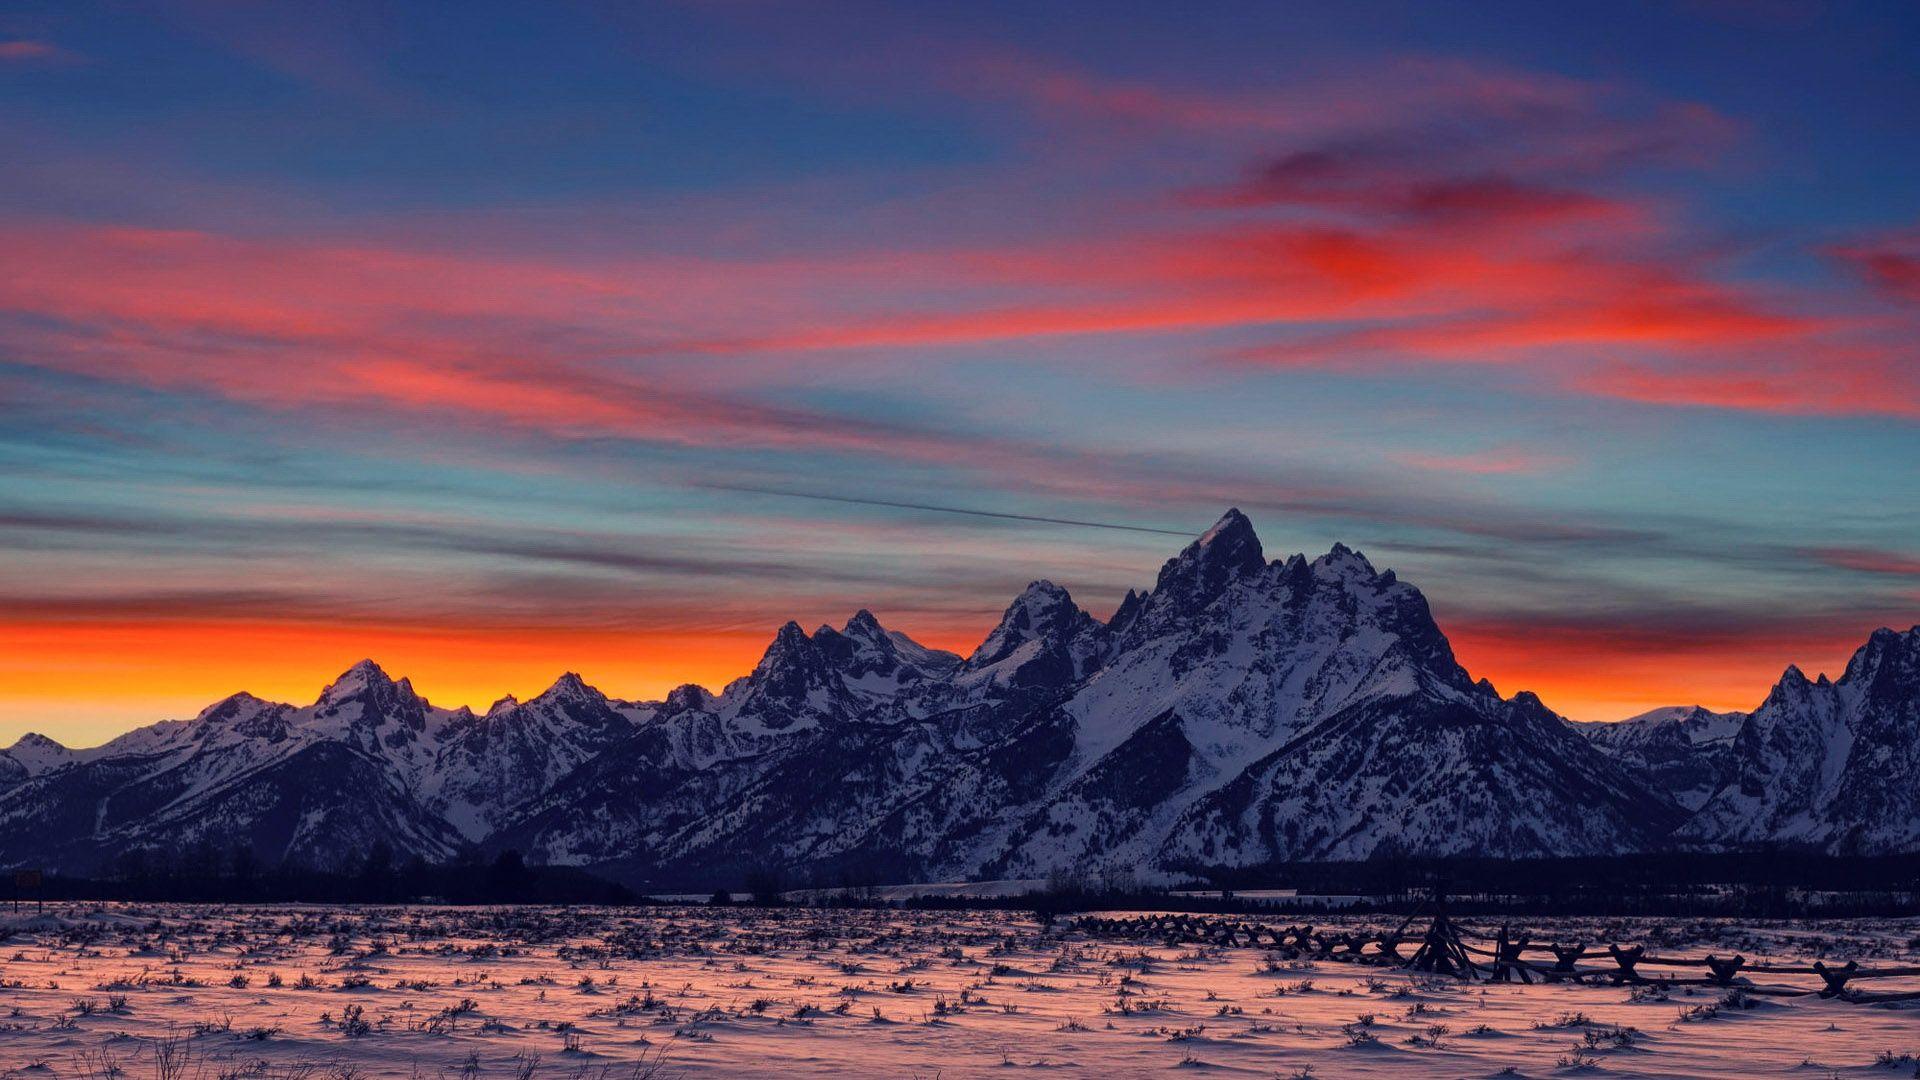 mountain sunset and sunrises majestic mountains